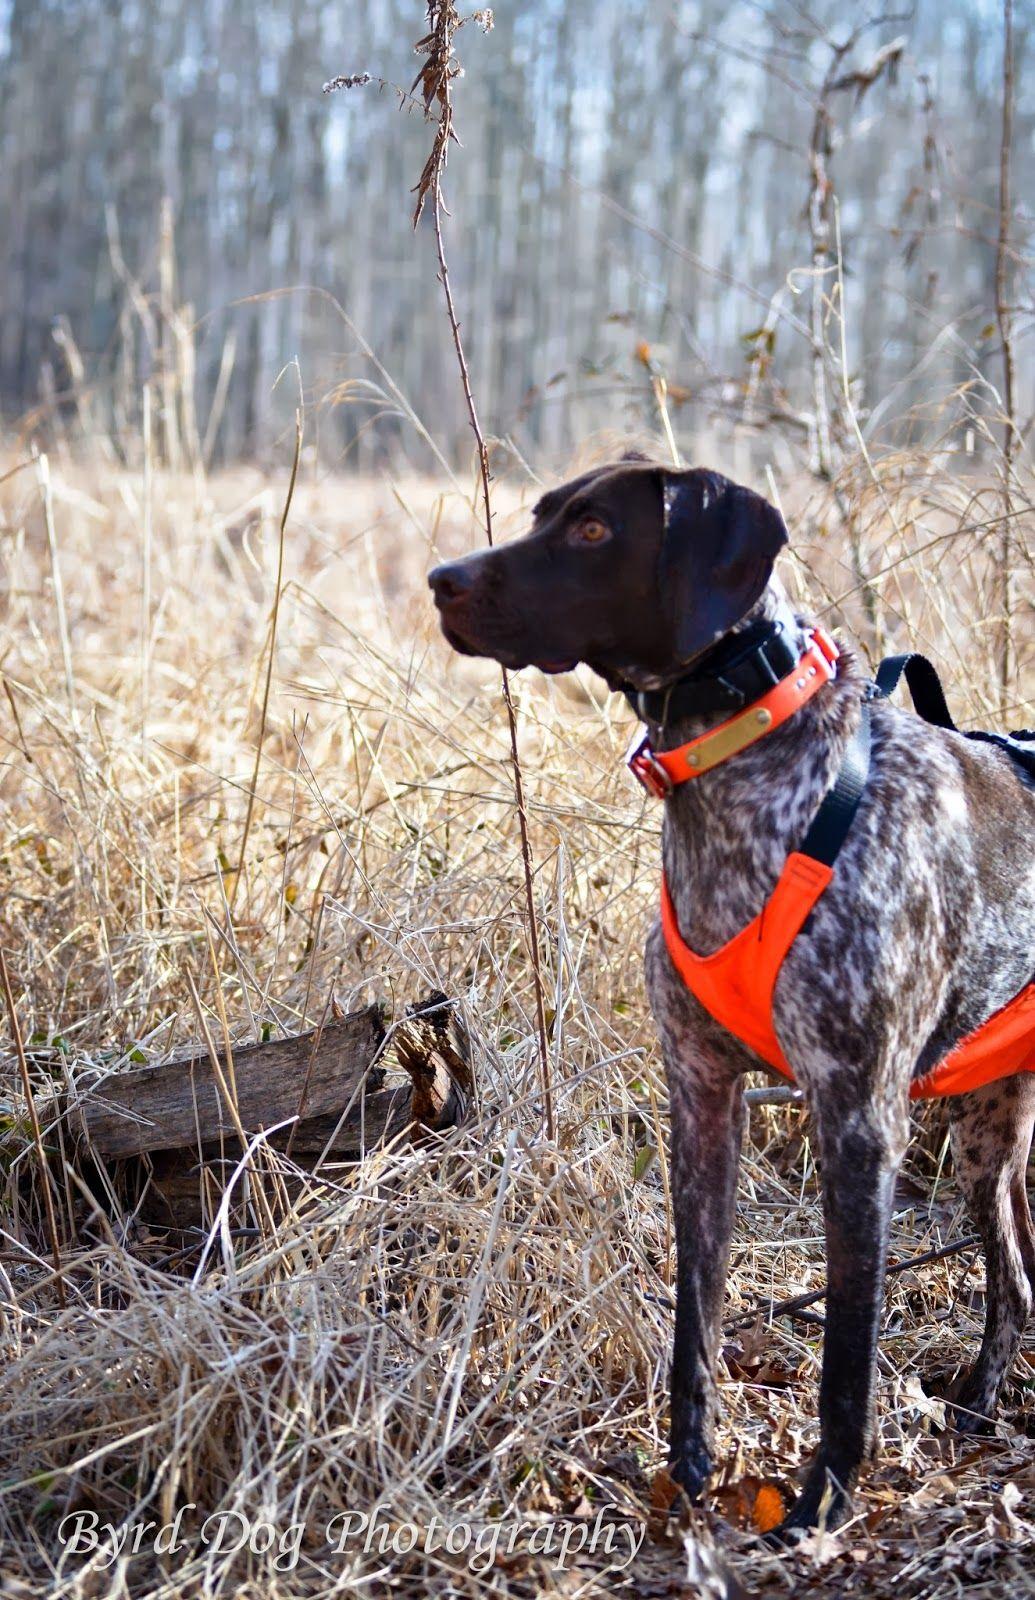 Nobelles Beautiful Cleopatra  Adventures of a GSP Hunting Dog #GSP # Germanshorthairedpointer #huntingdog #gundog #Byrddogphotography #hunting #upland #vonschonheitsGSPs